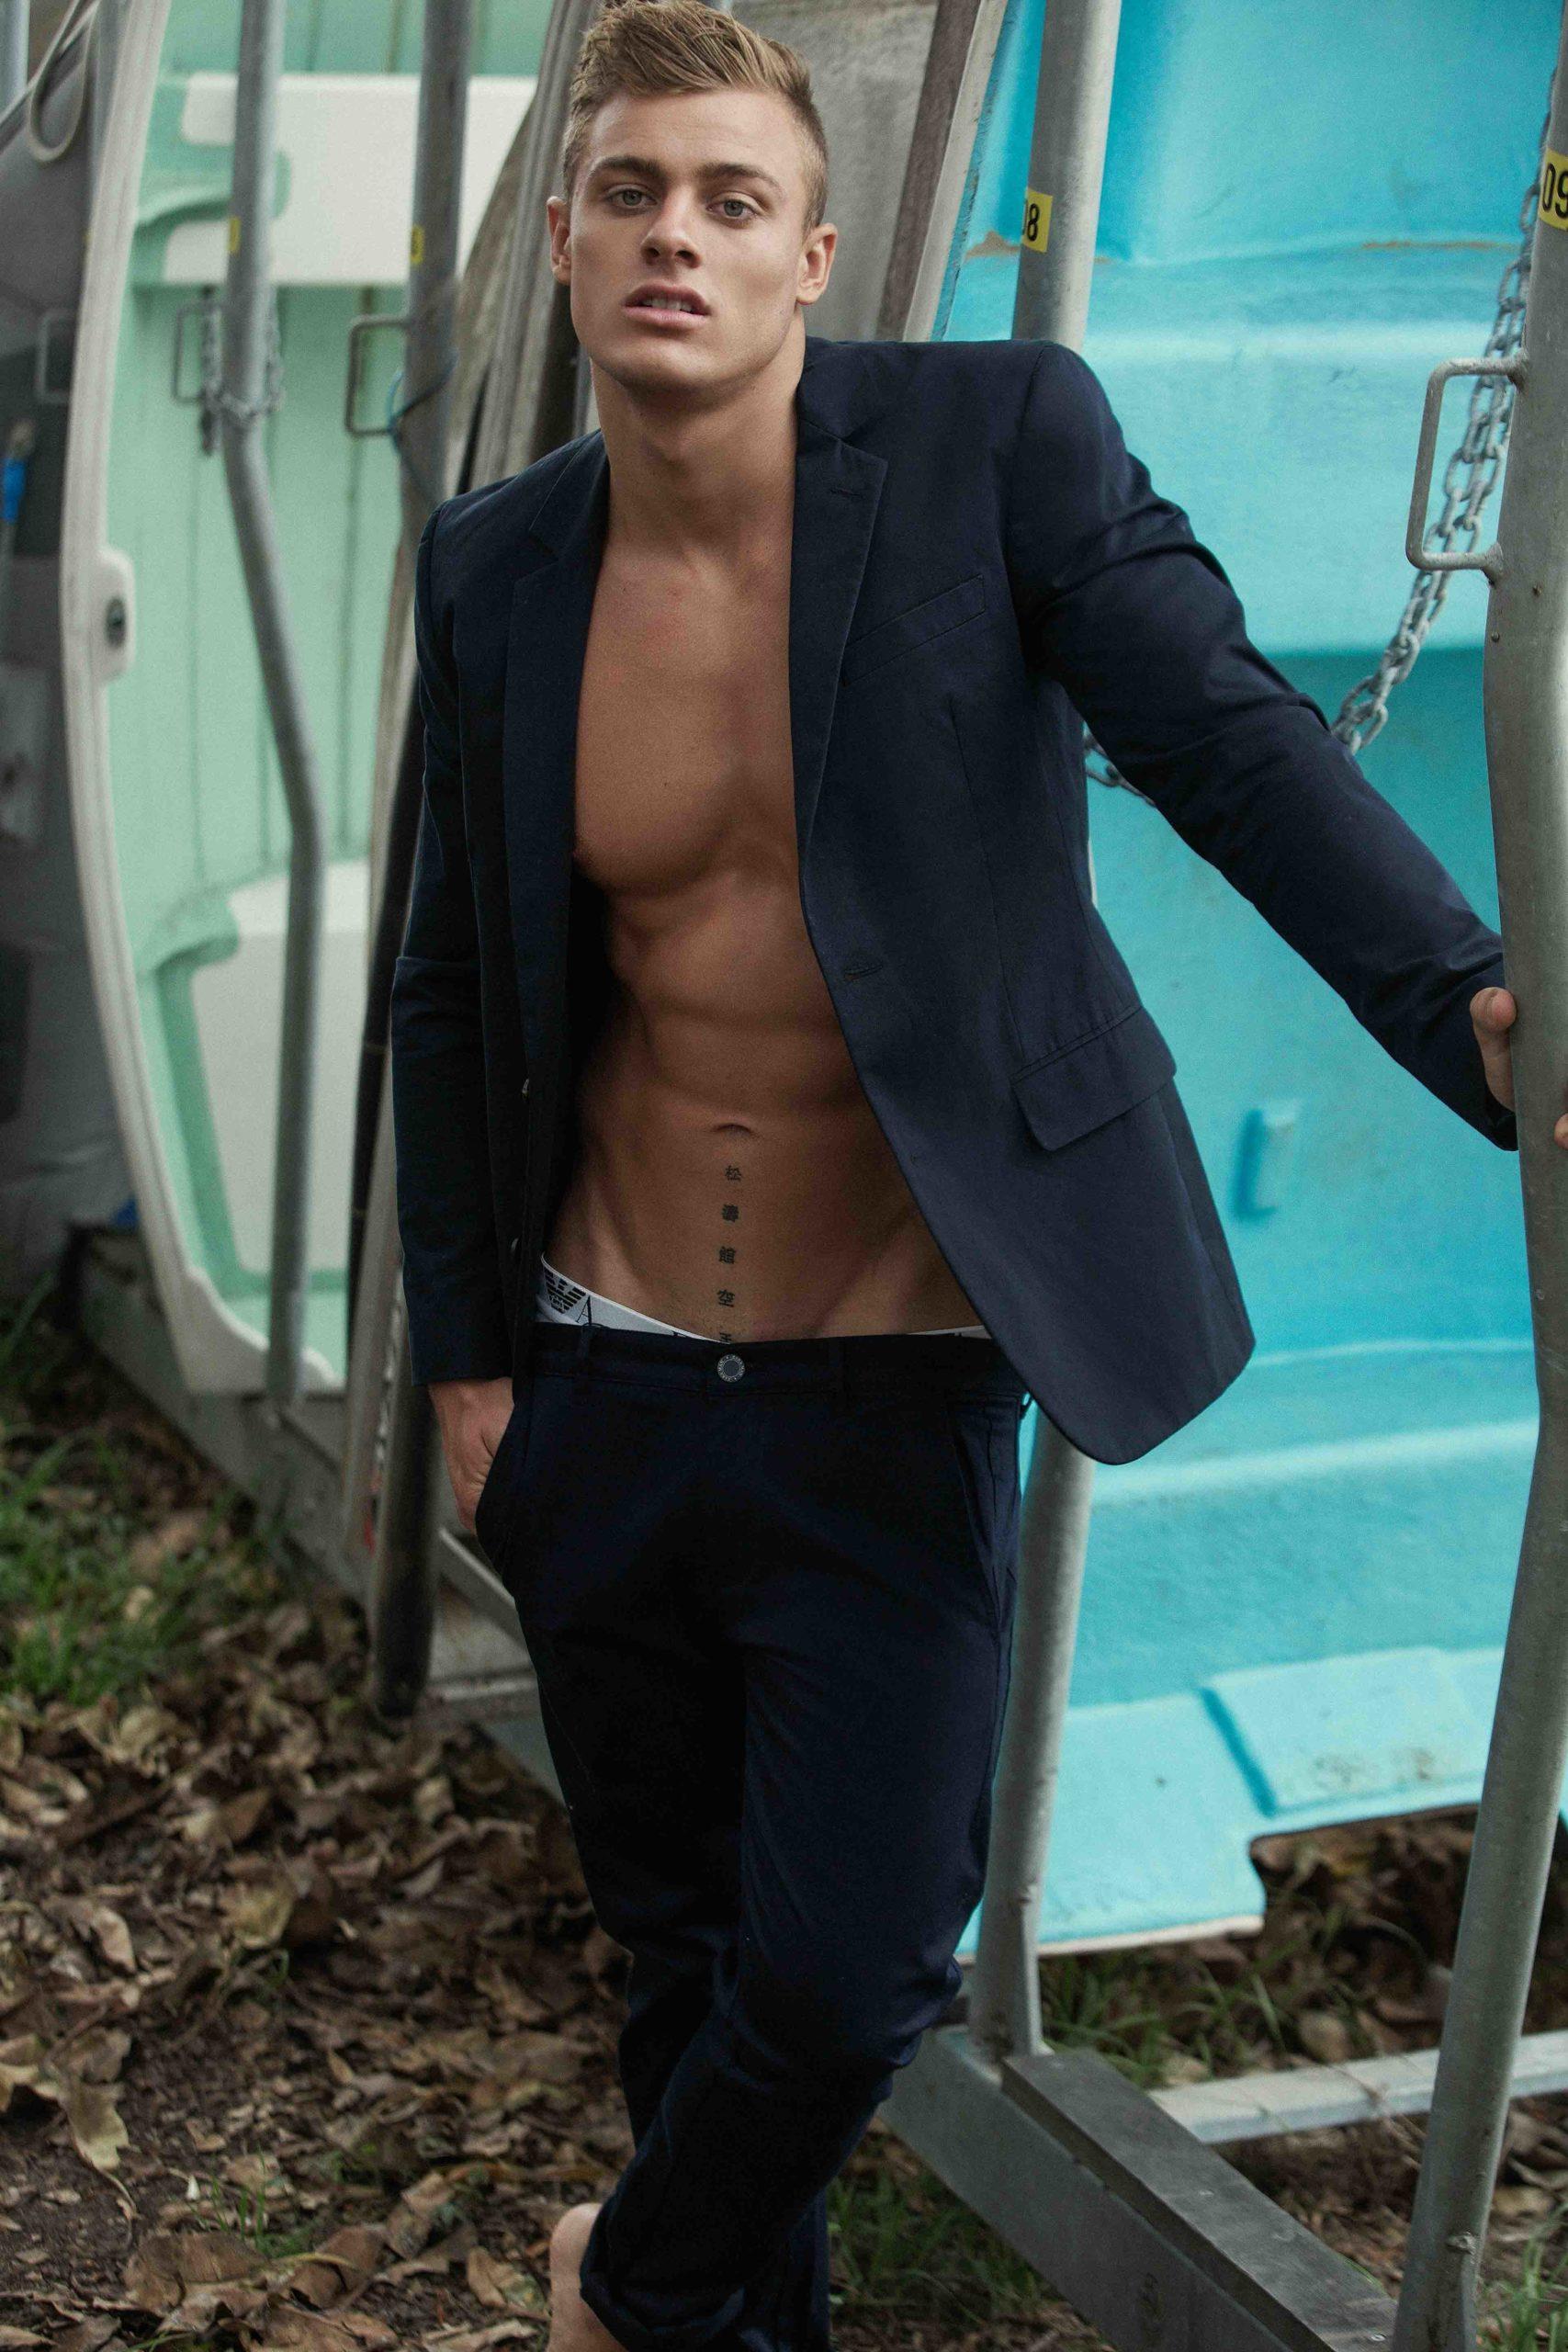 Drew Sydney's male fitness model